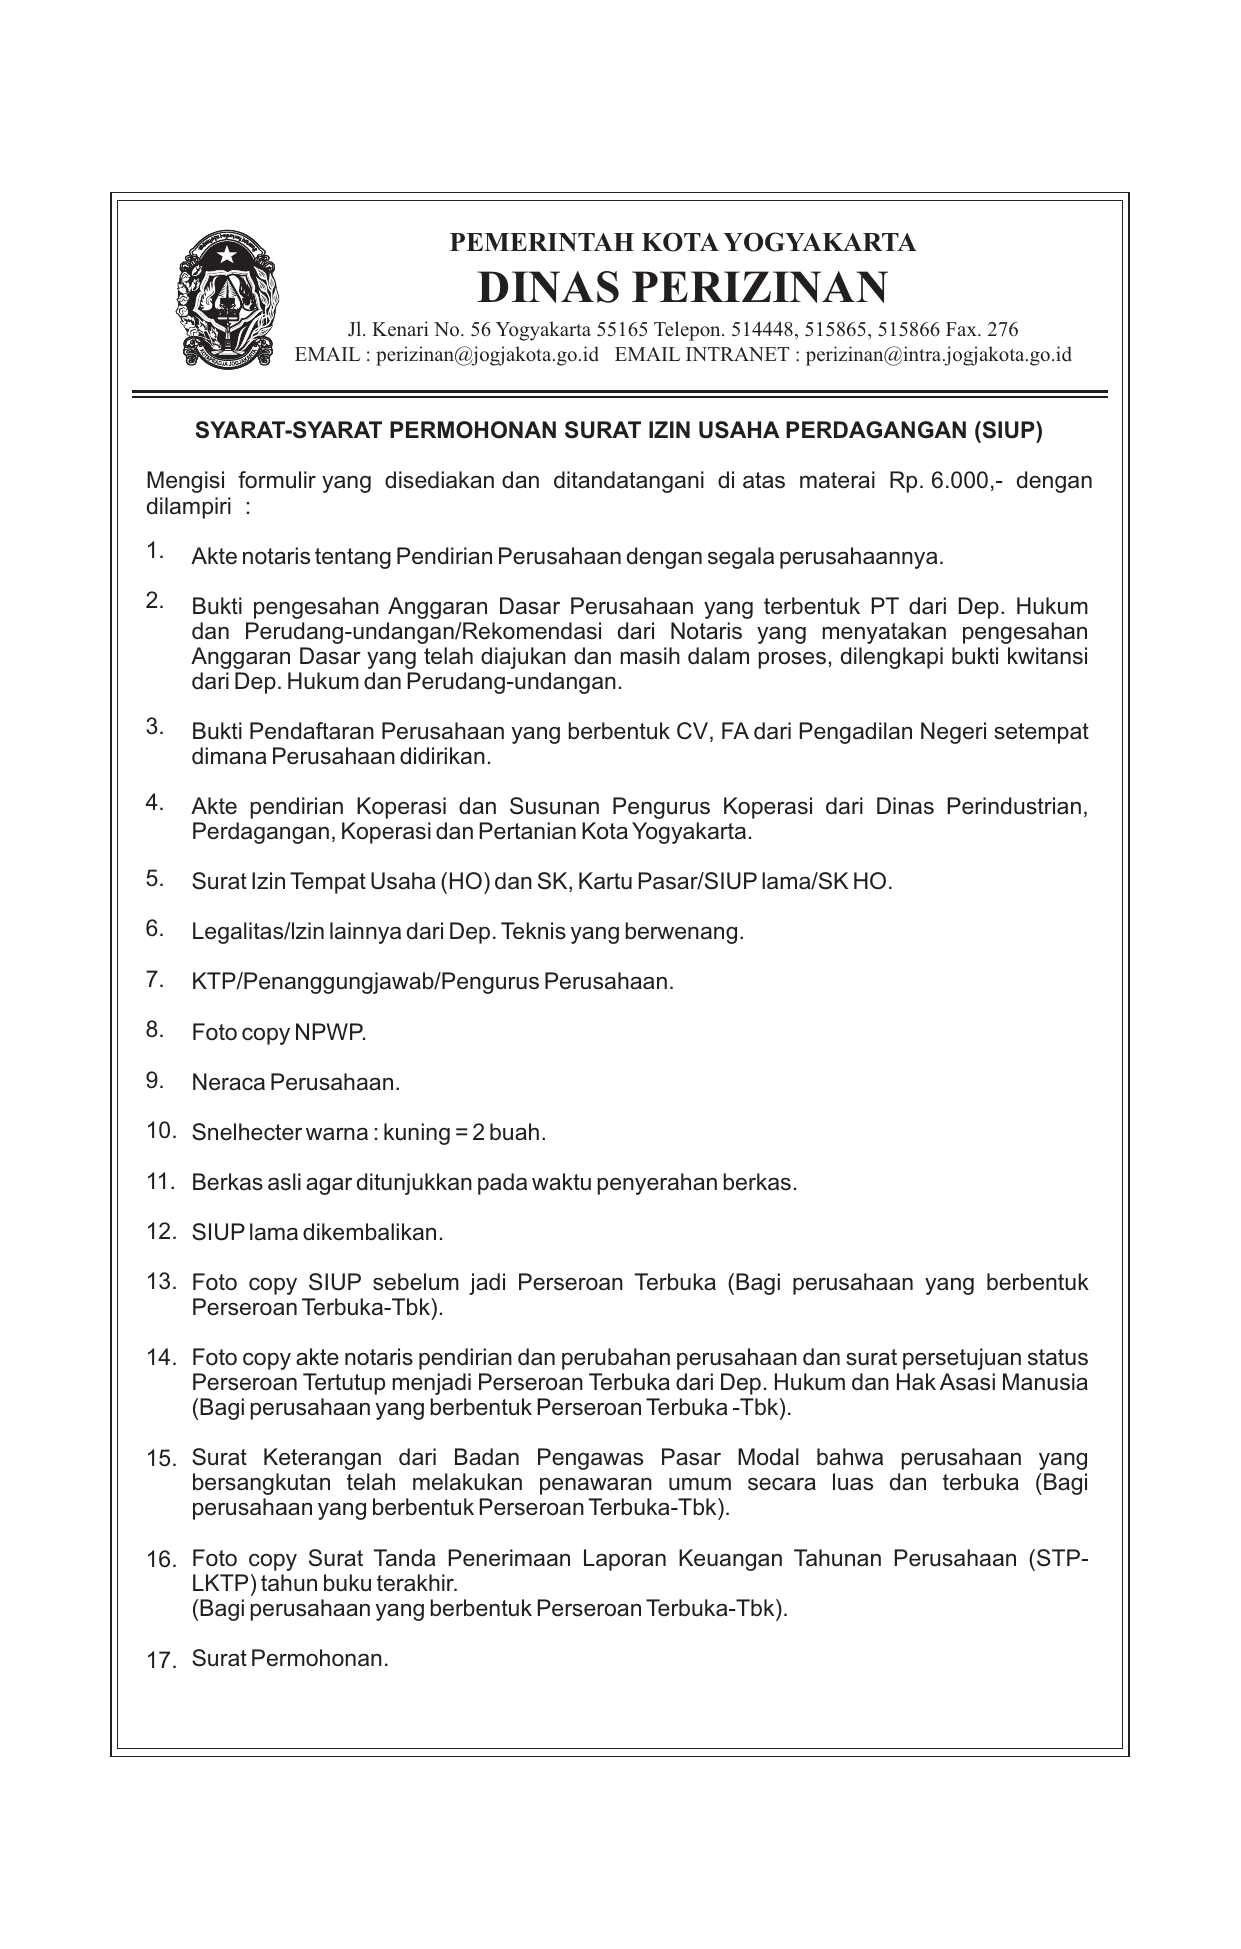 Permohonan Siup Dinas Perizinan Kota Yogyakarta